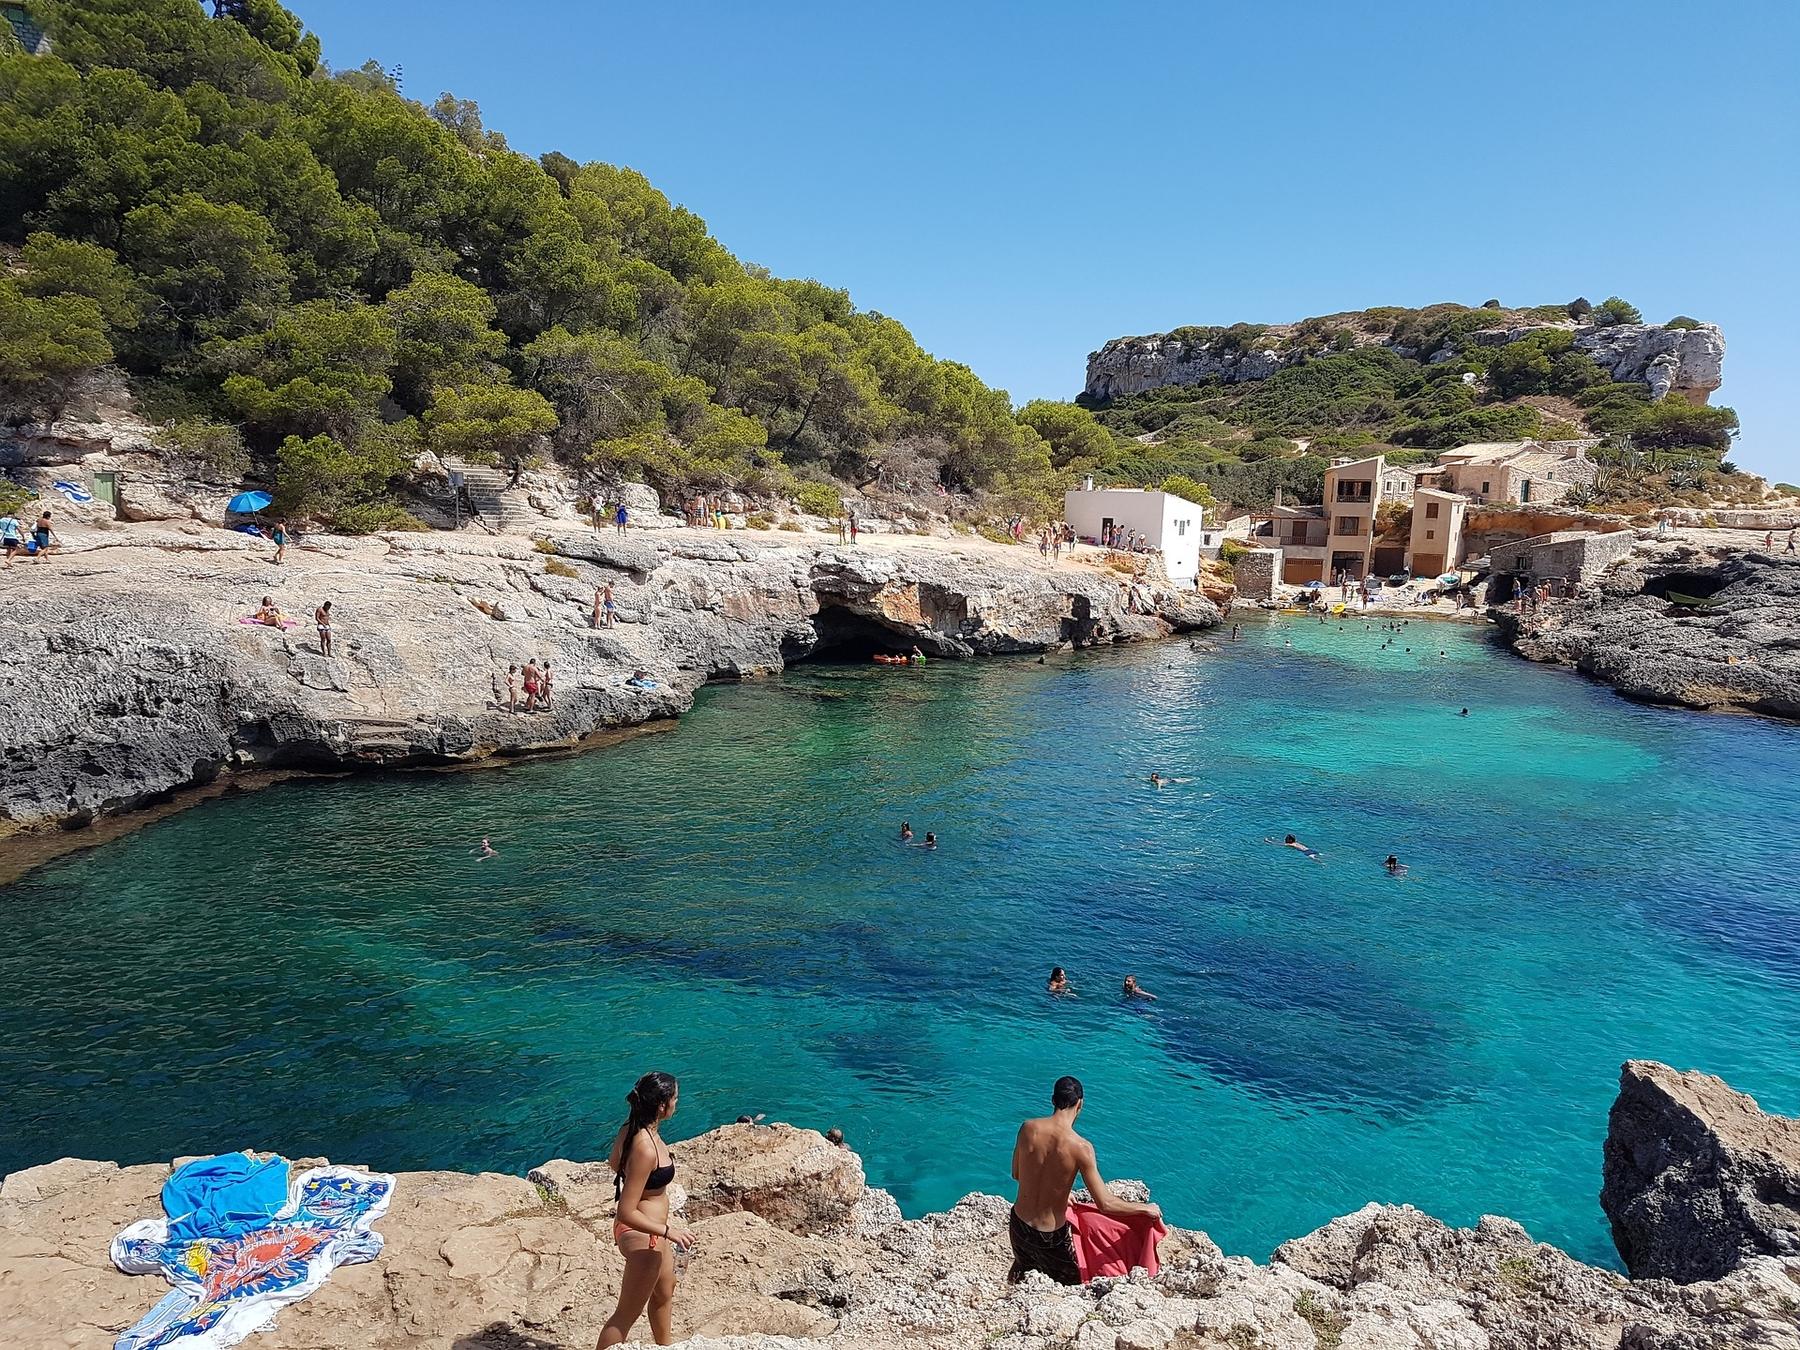 La oferta de calas y playas de Mallorca es tan extensa como apetecible